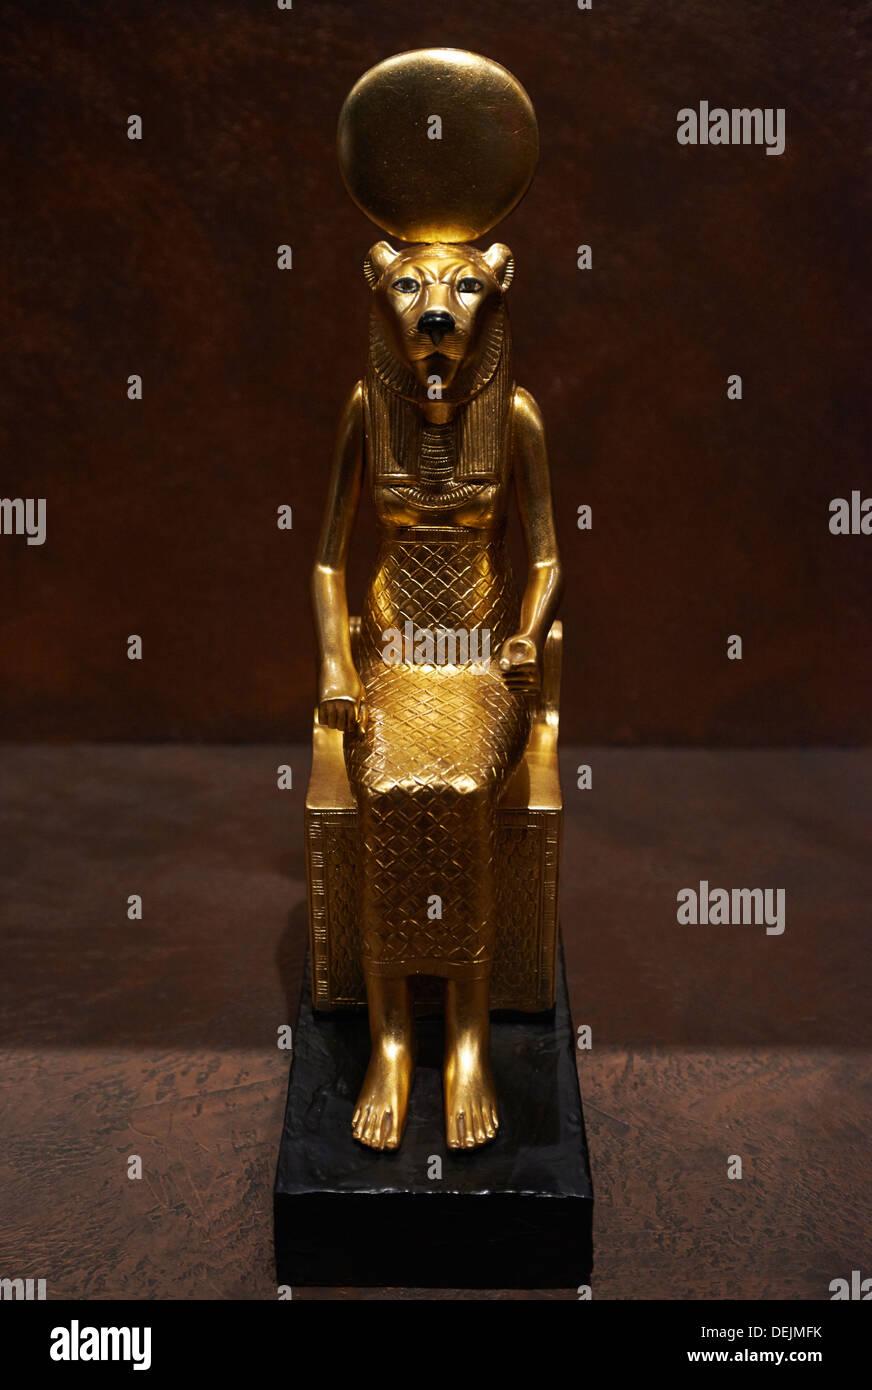 King Tutankhamun Imágenes De Stock & King Tutankhamun Fotos De Stock ...